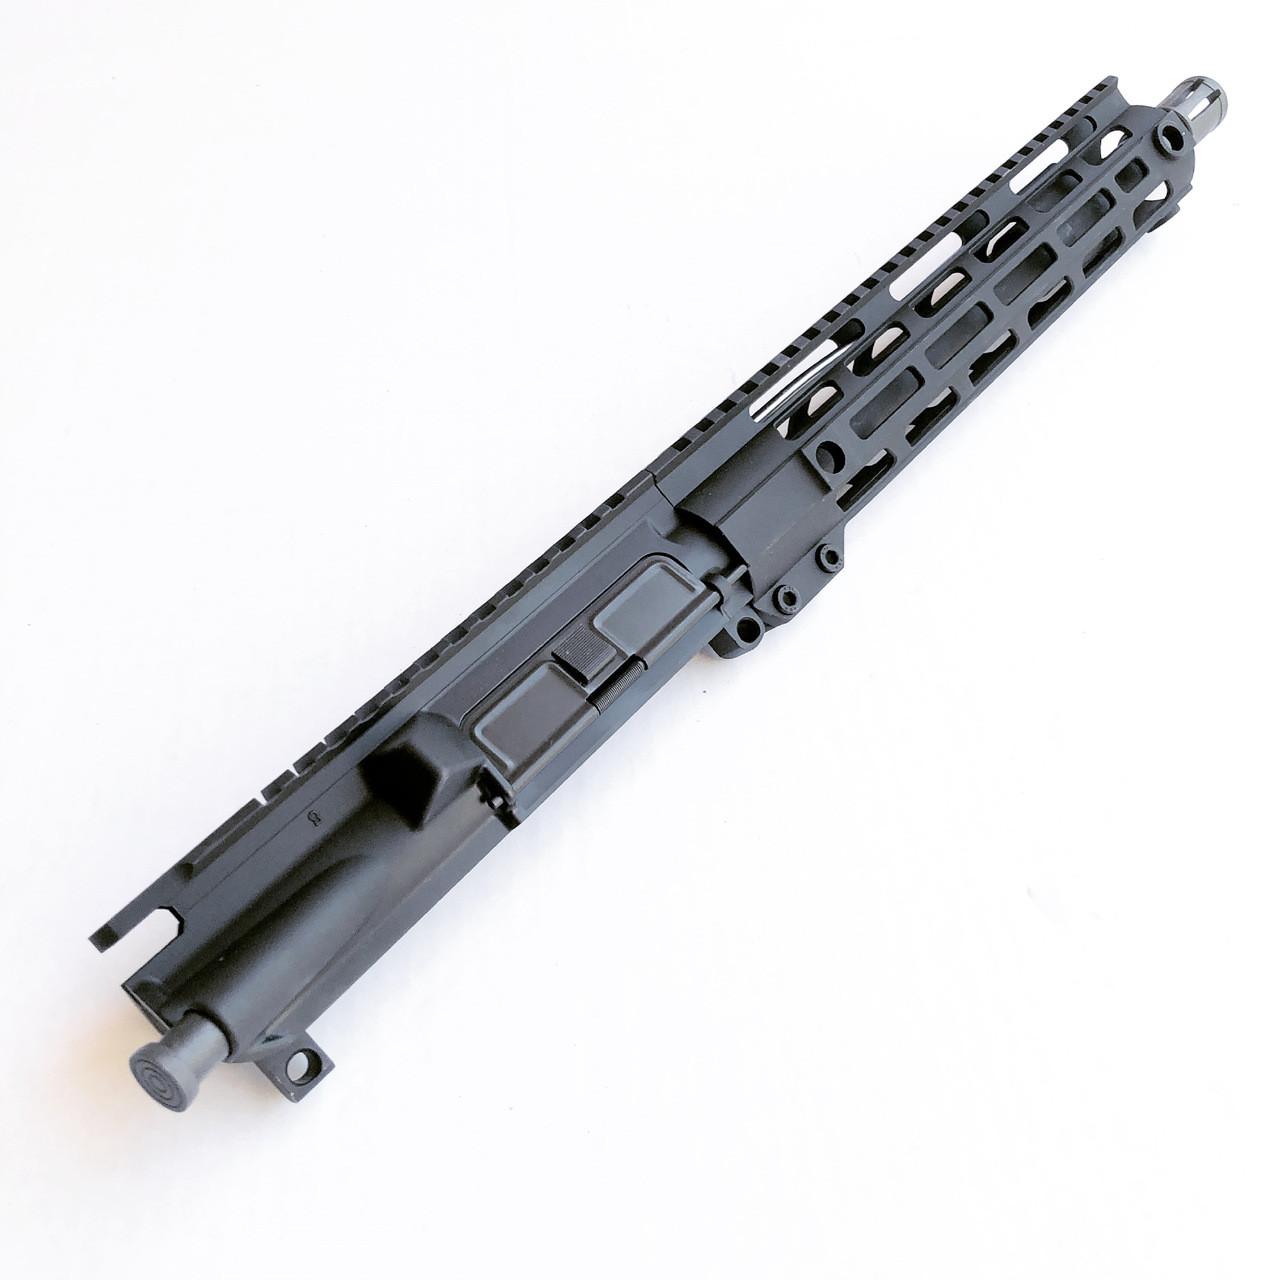 "AR-15 Pistol Upper, .300 Blackout, 10.5"" Barrel, 1:8 Twist, Pistol Gas System"